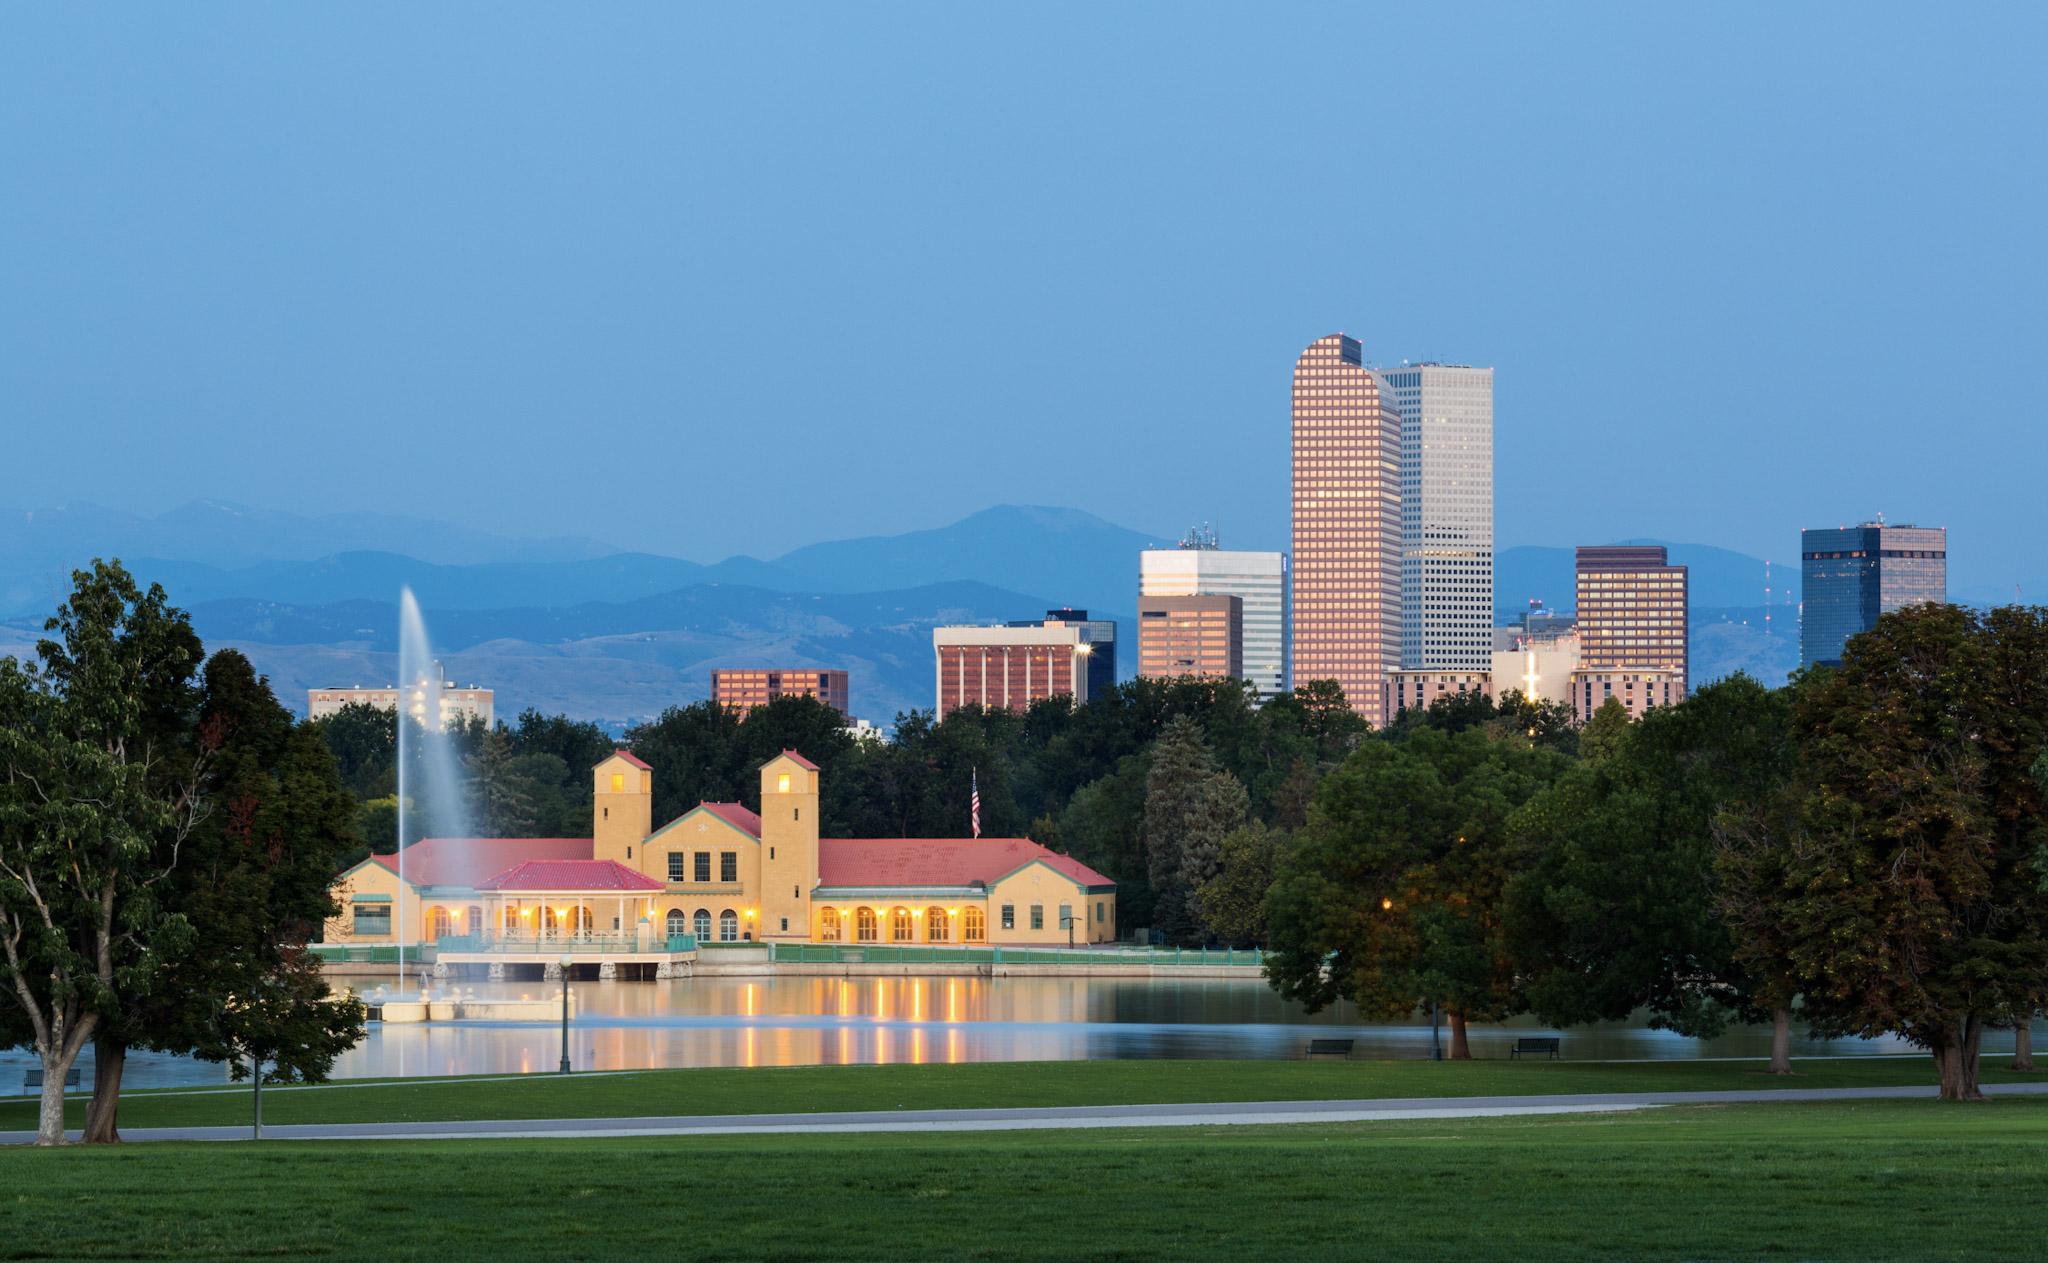 Denver skyline photo. Source: Adobe Stock